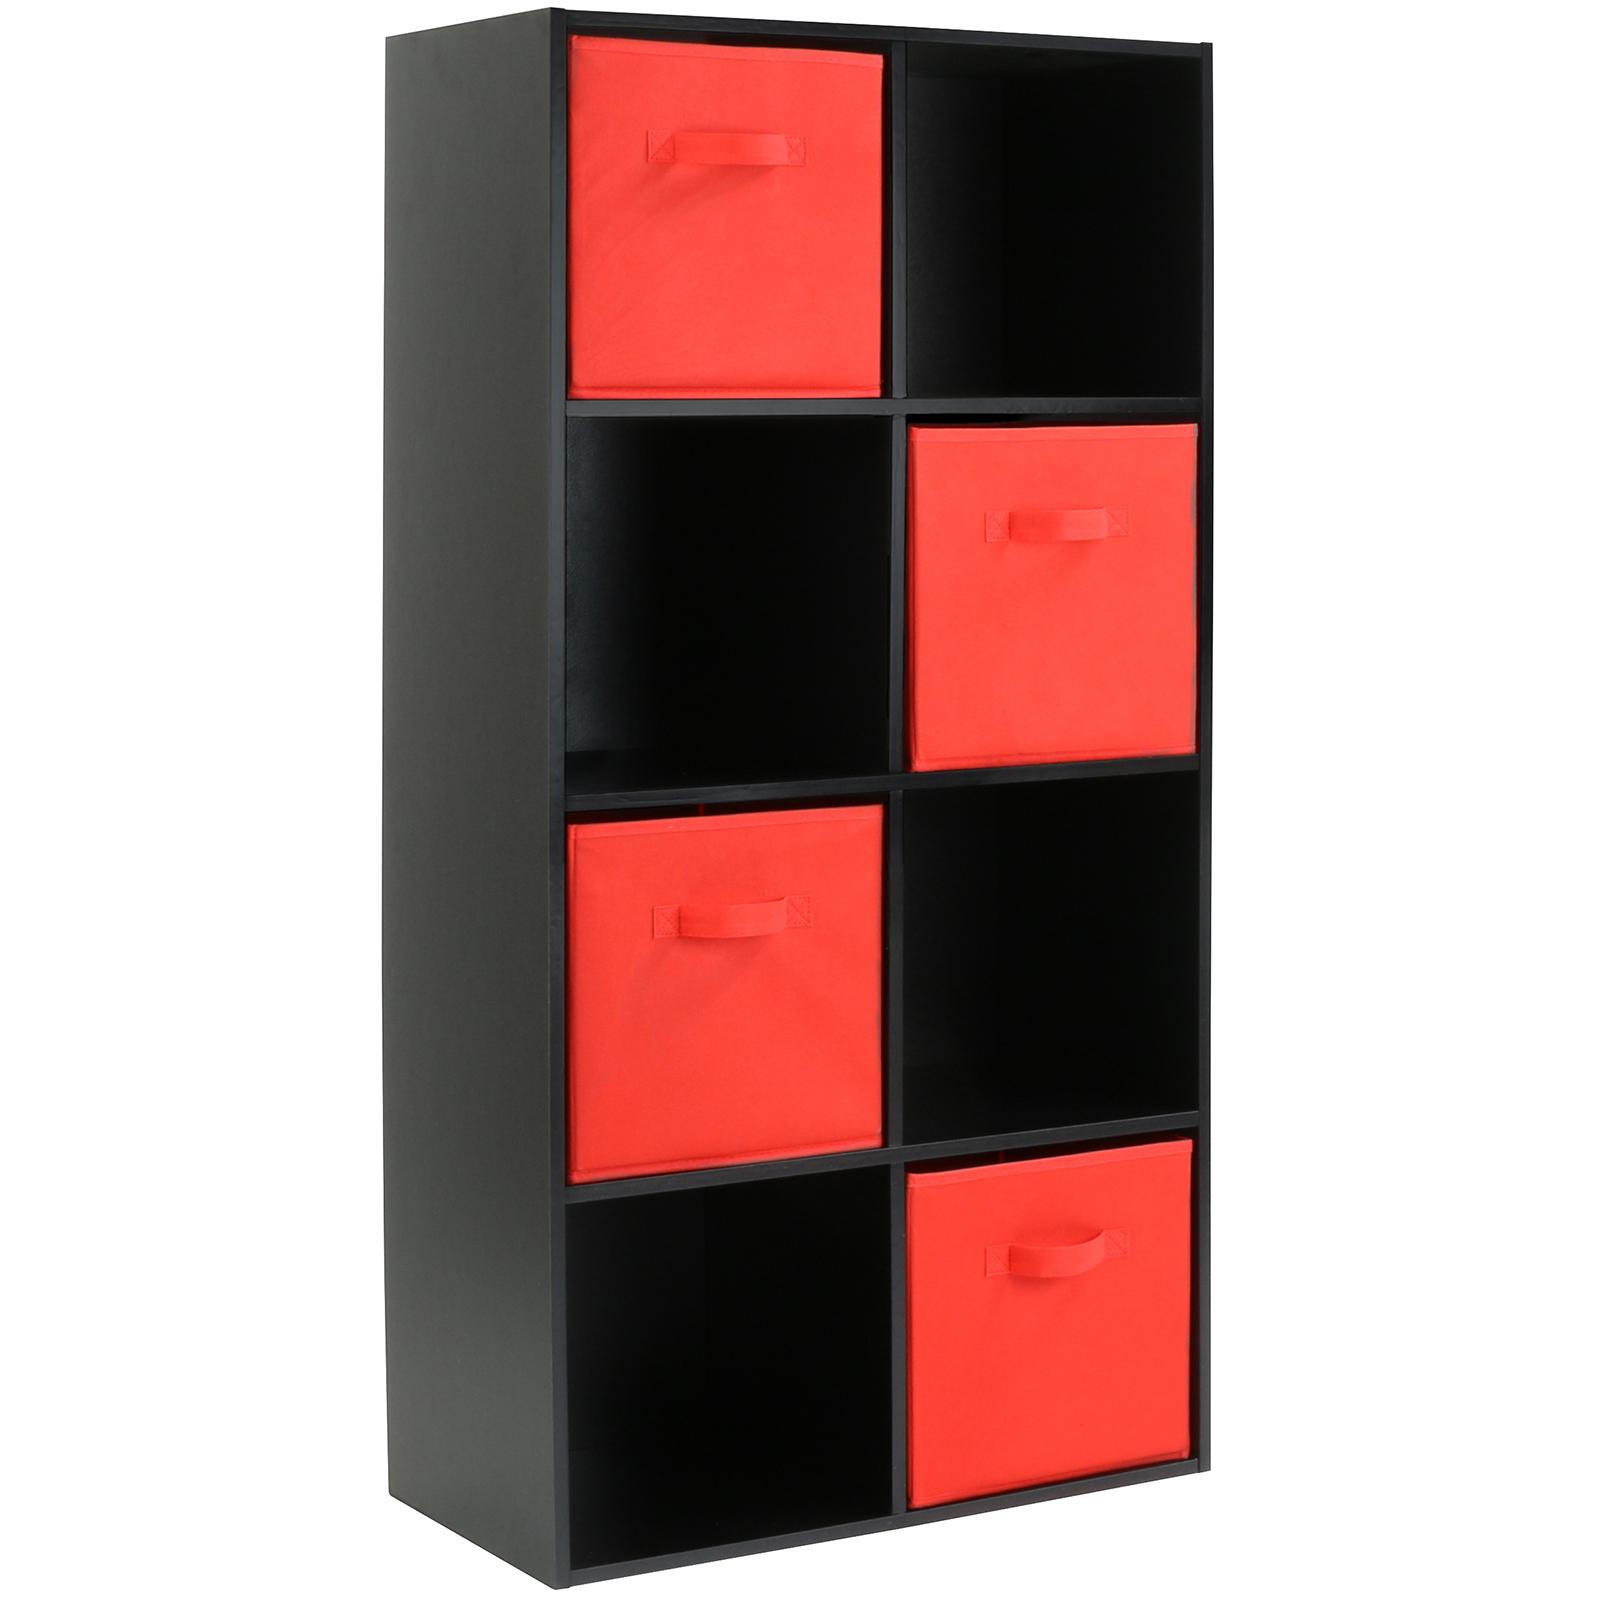 hartleys black 8 cube modular shelving display unit 4 x red fabric storage box. Black Bedroom Furniture Sets. Home Design Ideas